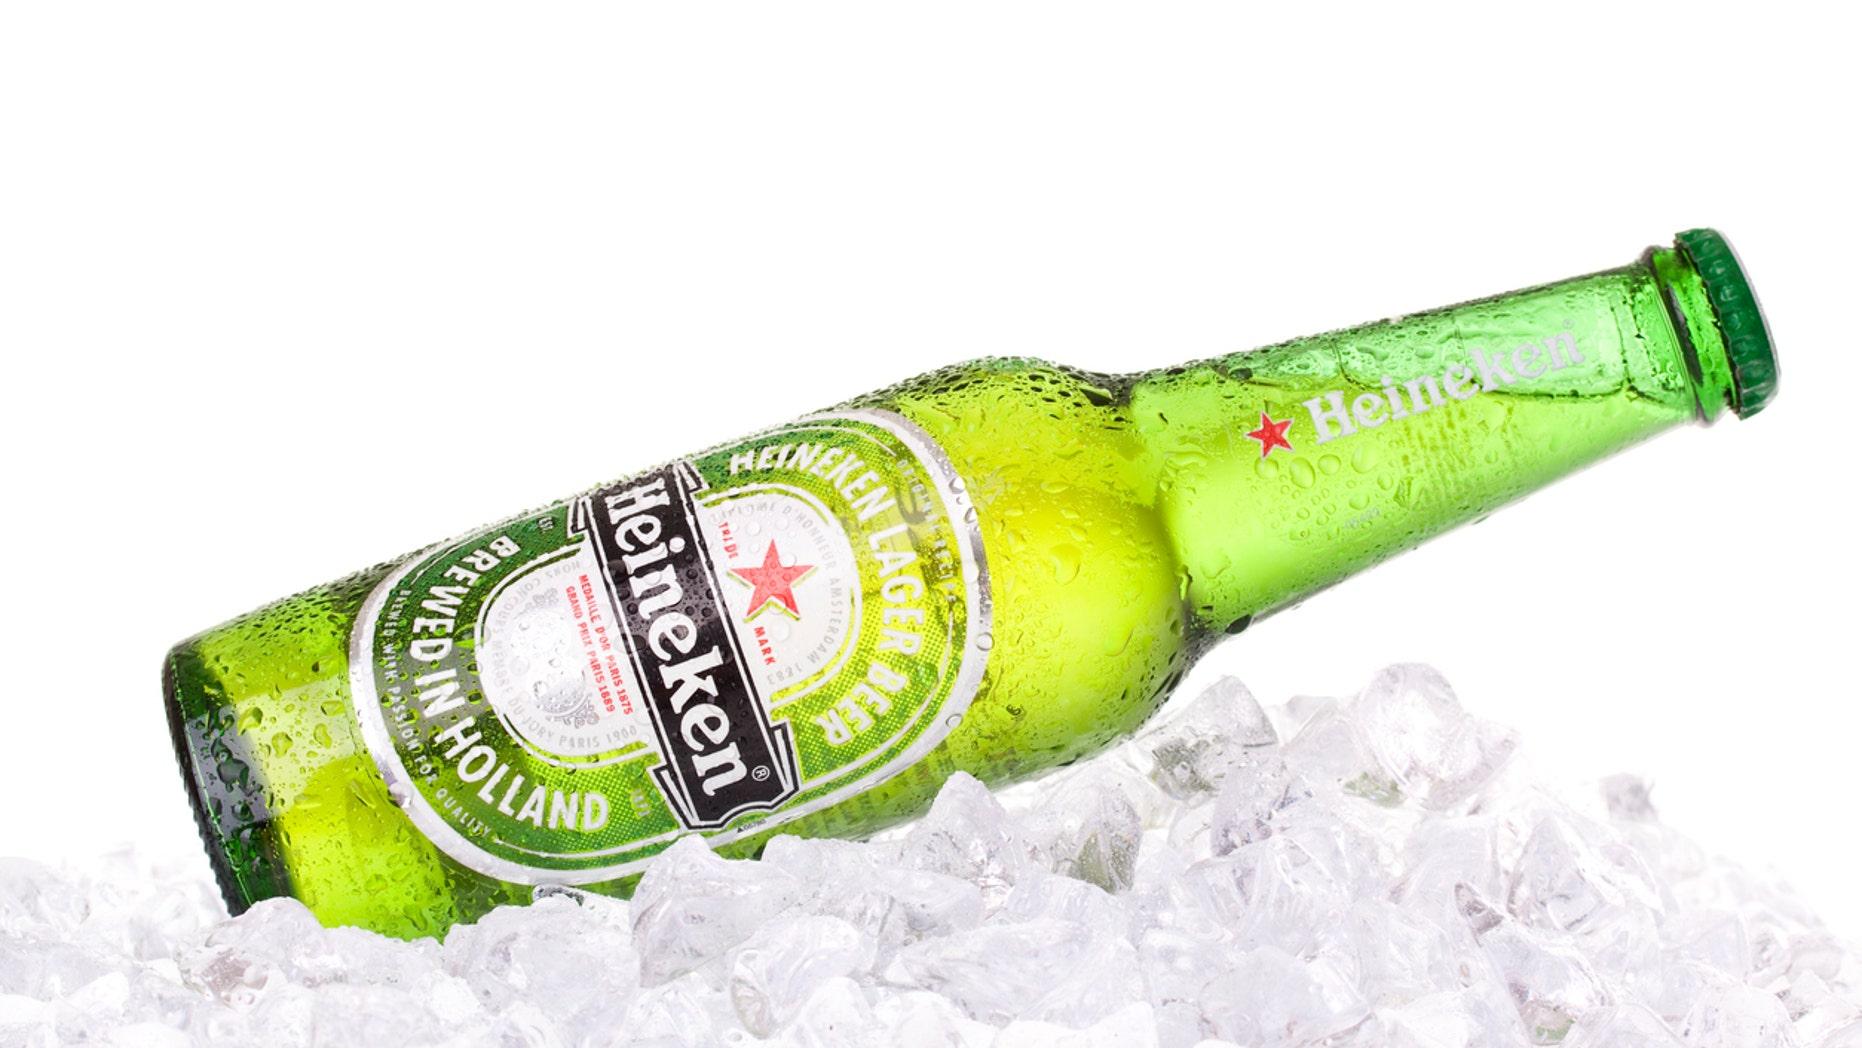 Heineken has removed a commercial after severe social media backlash.